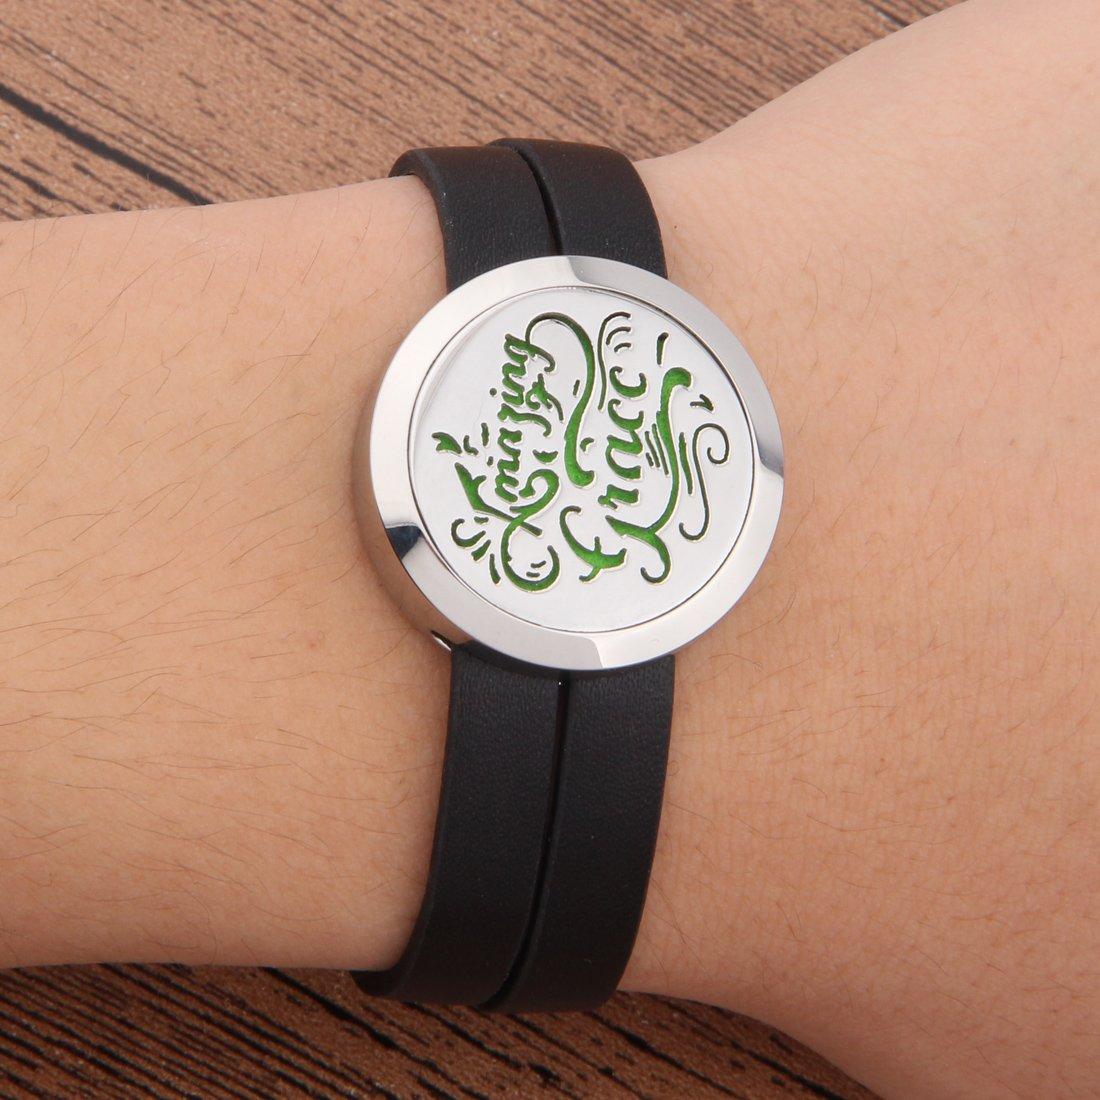 Zuo Bao Stainless Steel Aromatherapy Diffuser Locket Bracelet with Leather Wrap (Bracelet 1)